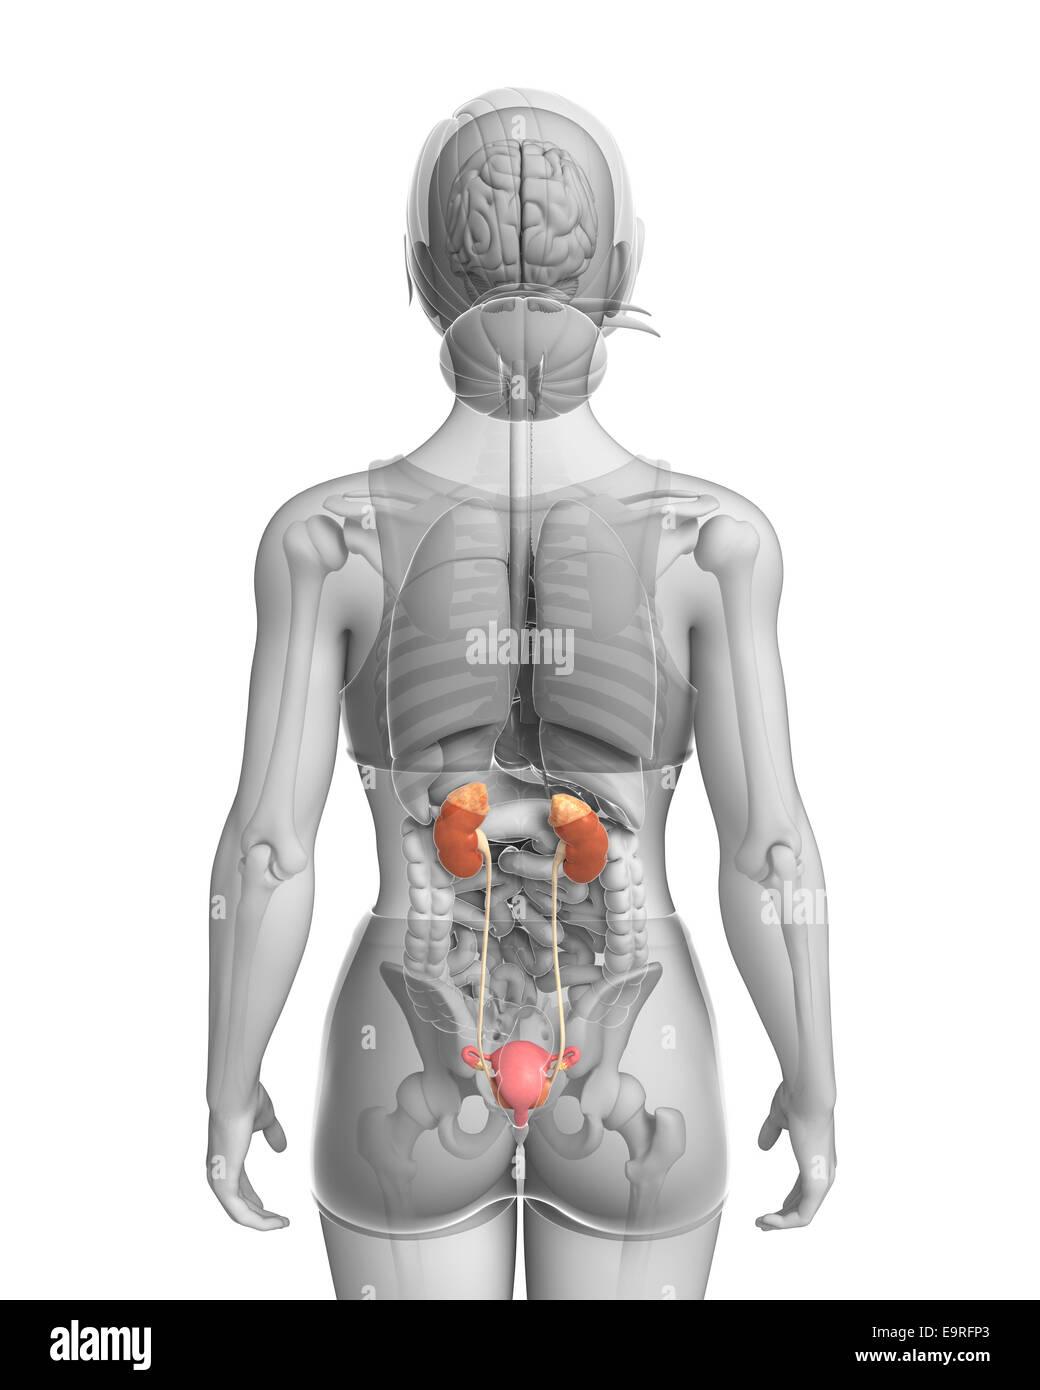 Old Fashioned Pelvic Anatomy Female Illustration Component - Human ...